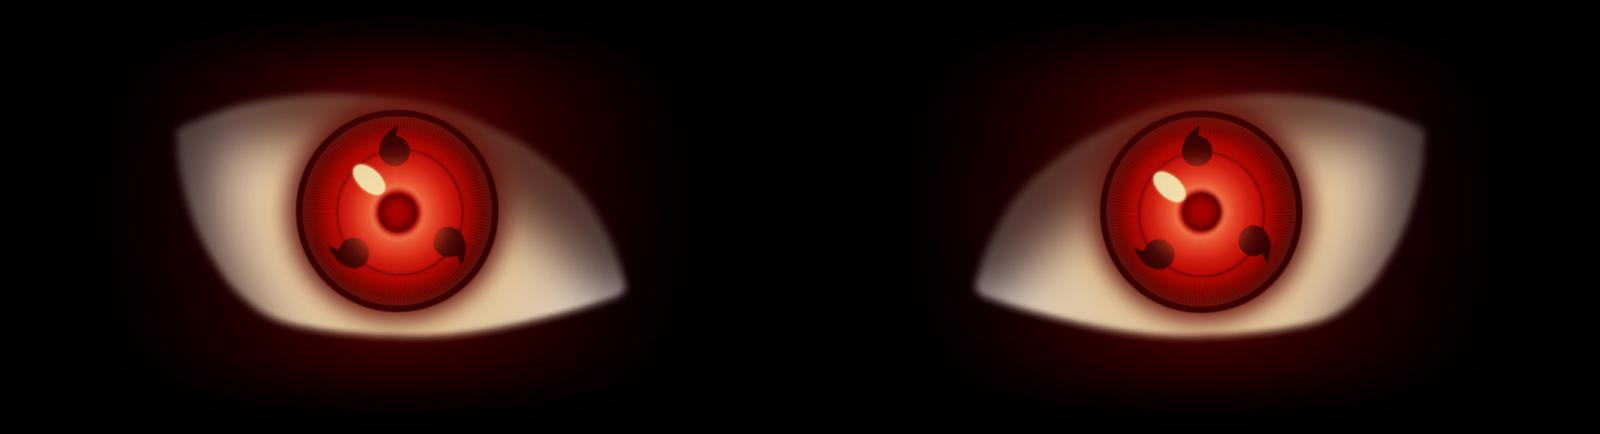 Clan Uchiha [Konoha] Sharingan_by_mod_a_holic-d4ulrtp